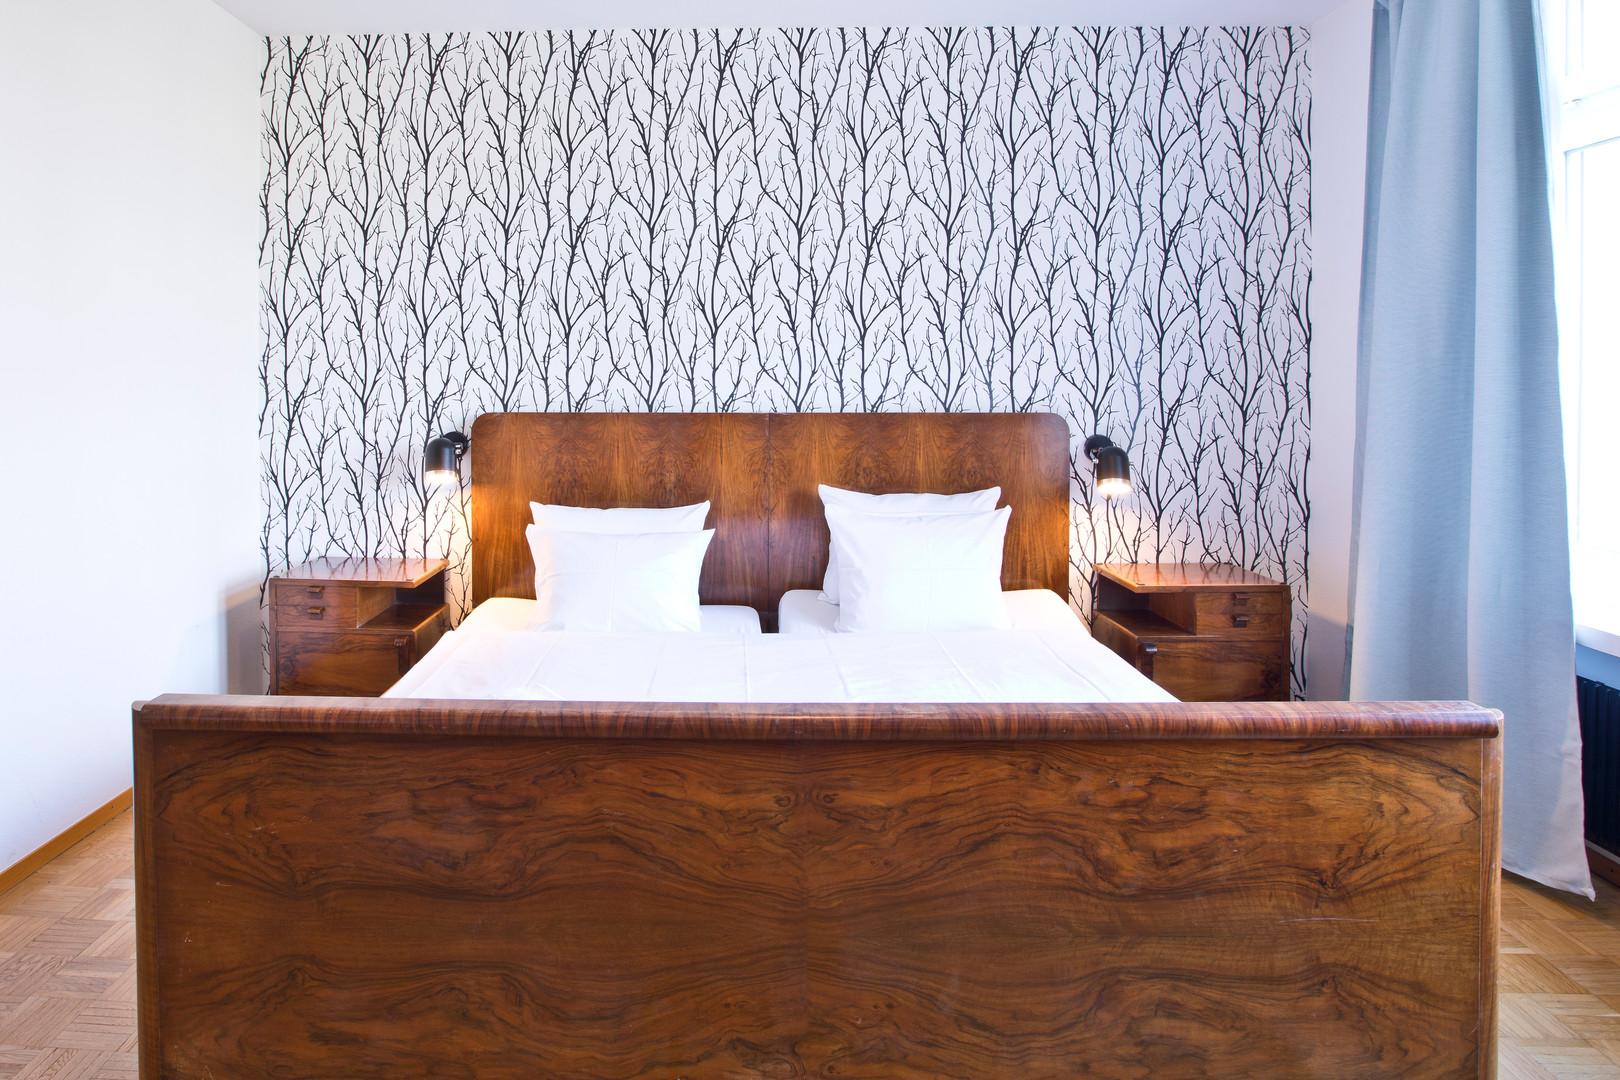 Room 23: Bed